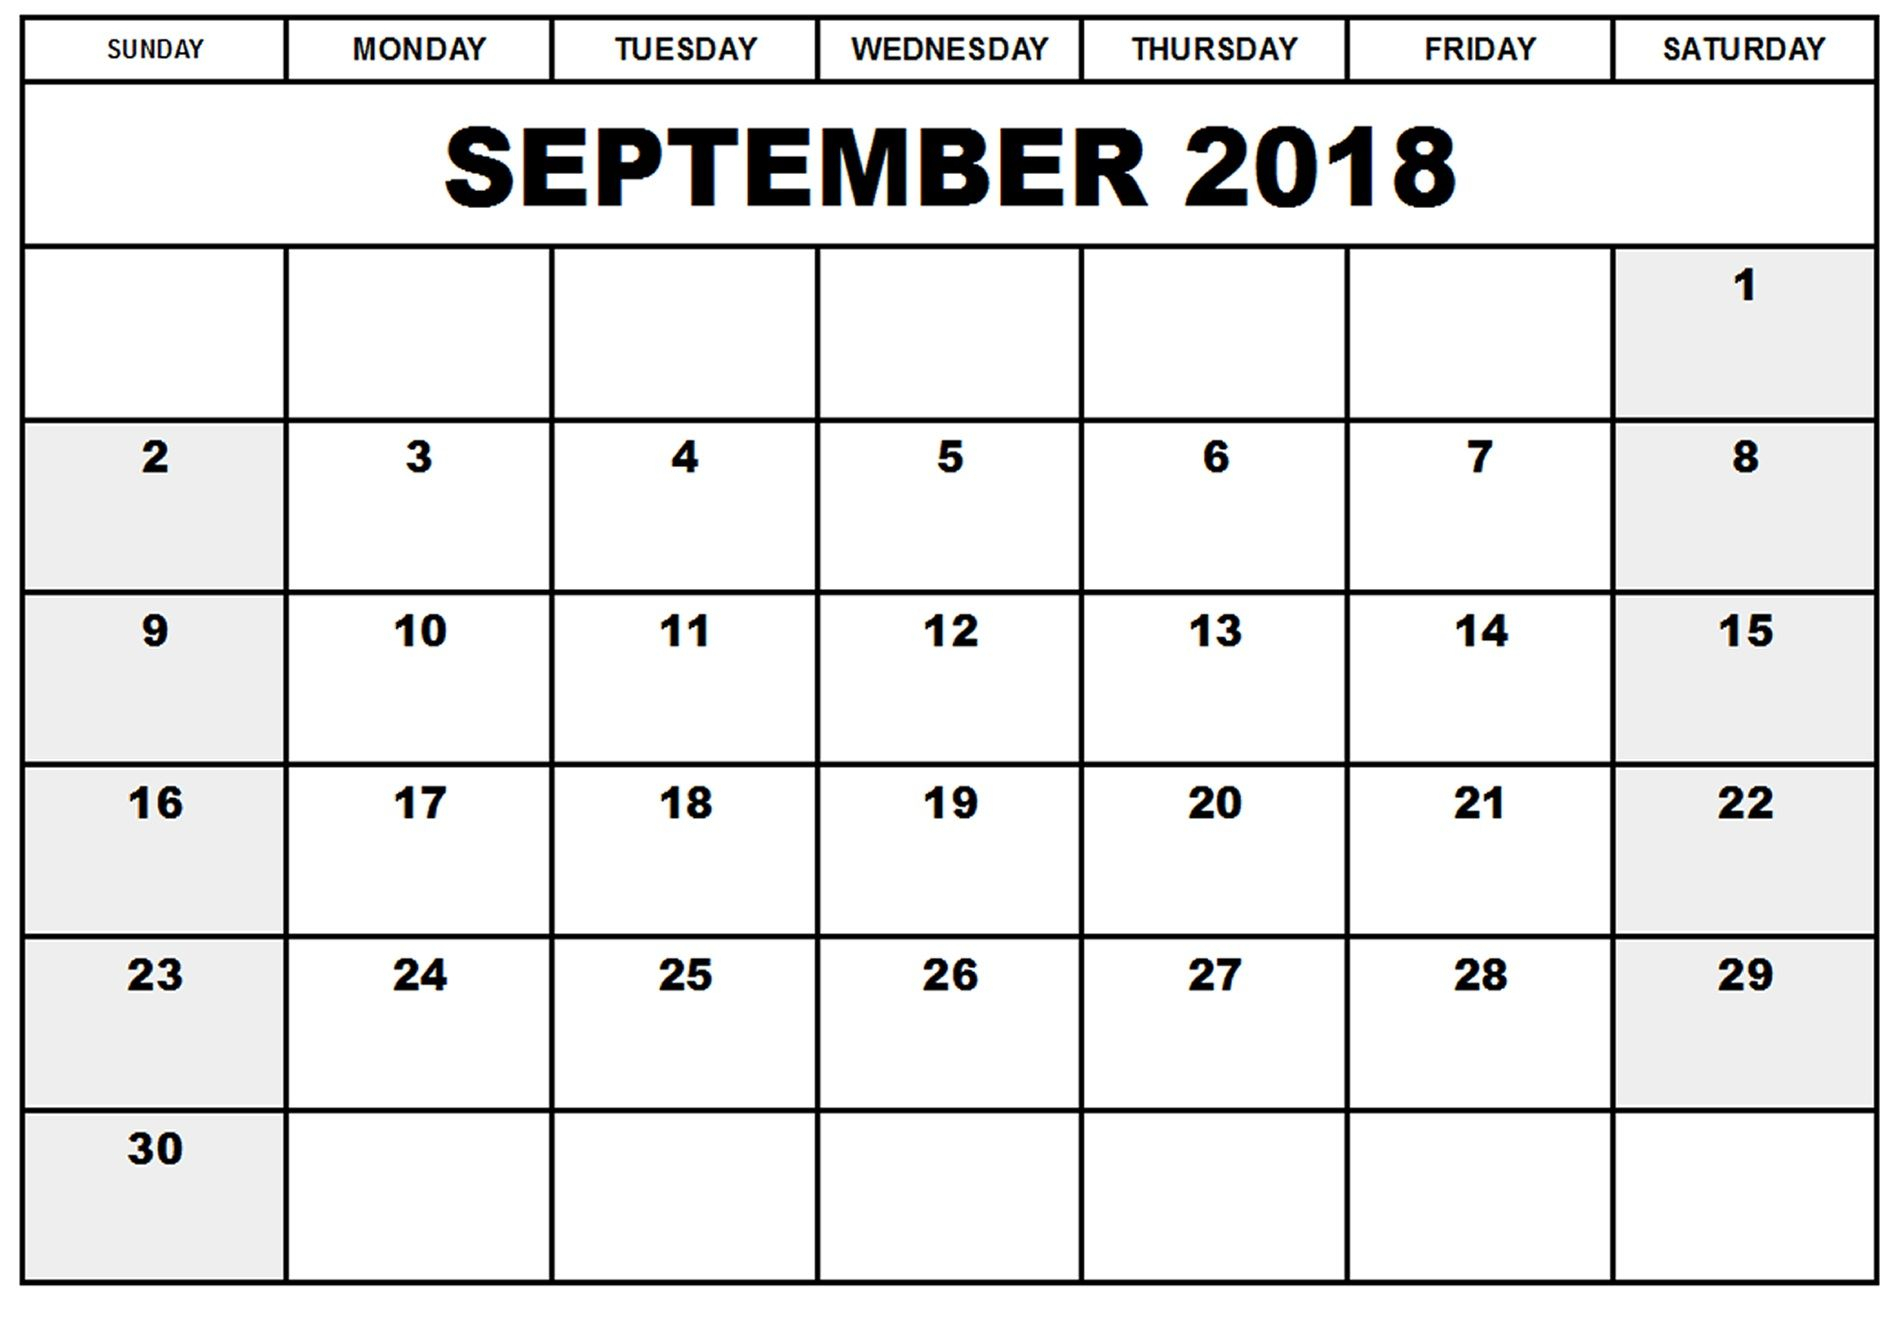 Print September 2018 Calendar Printable Monthly Template